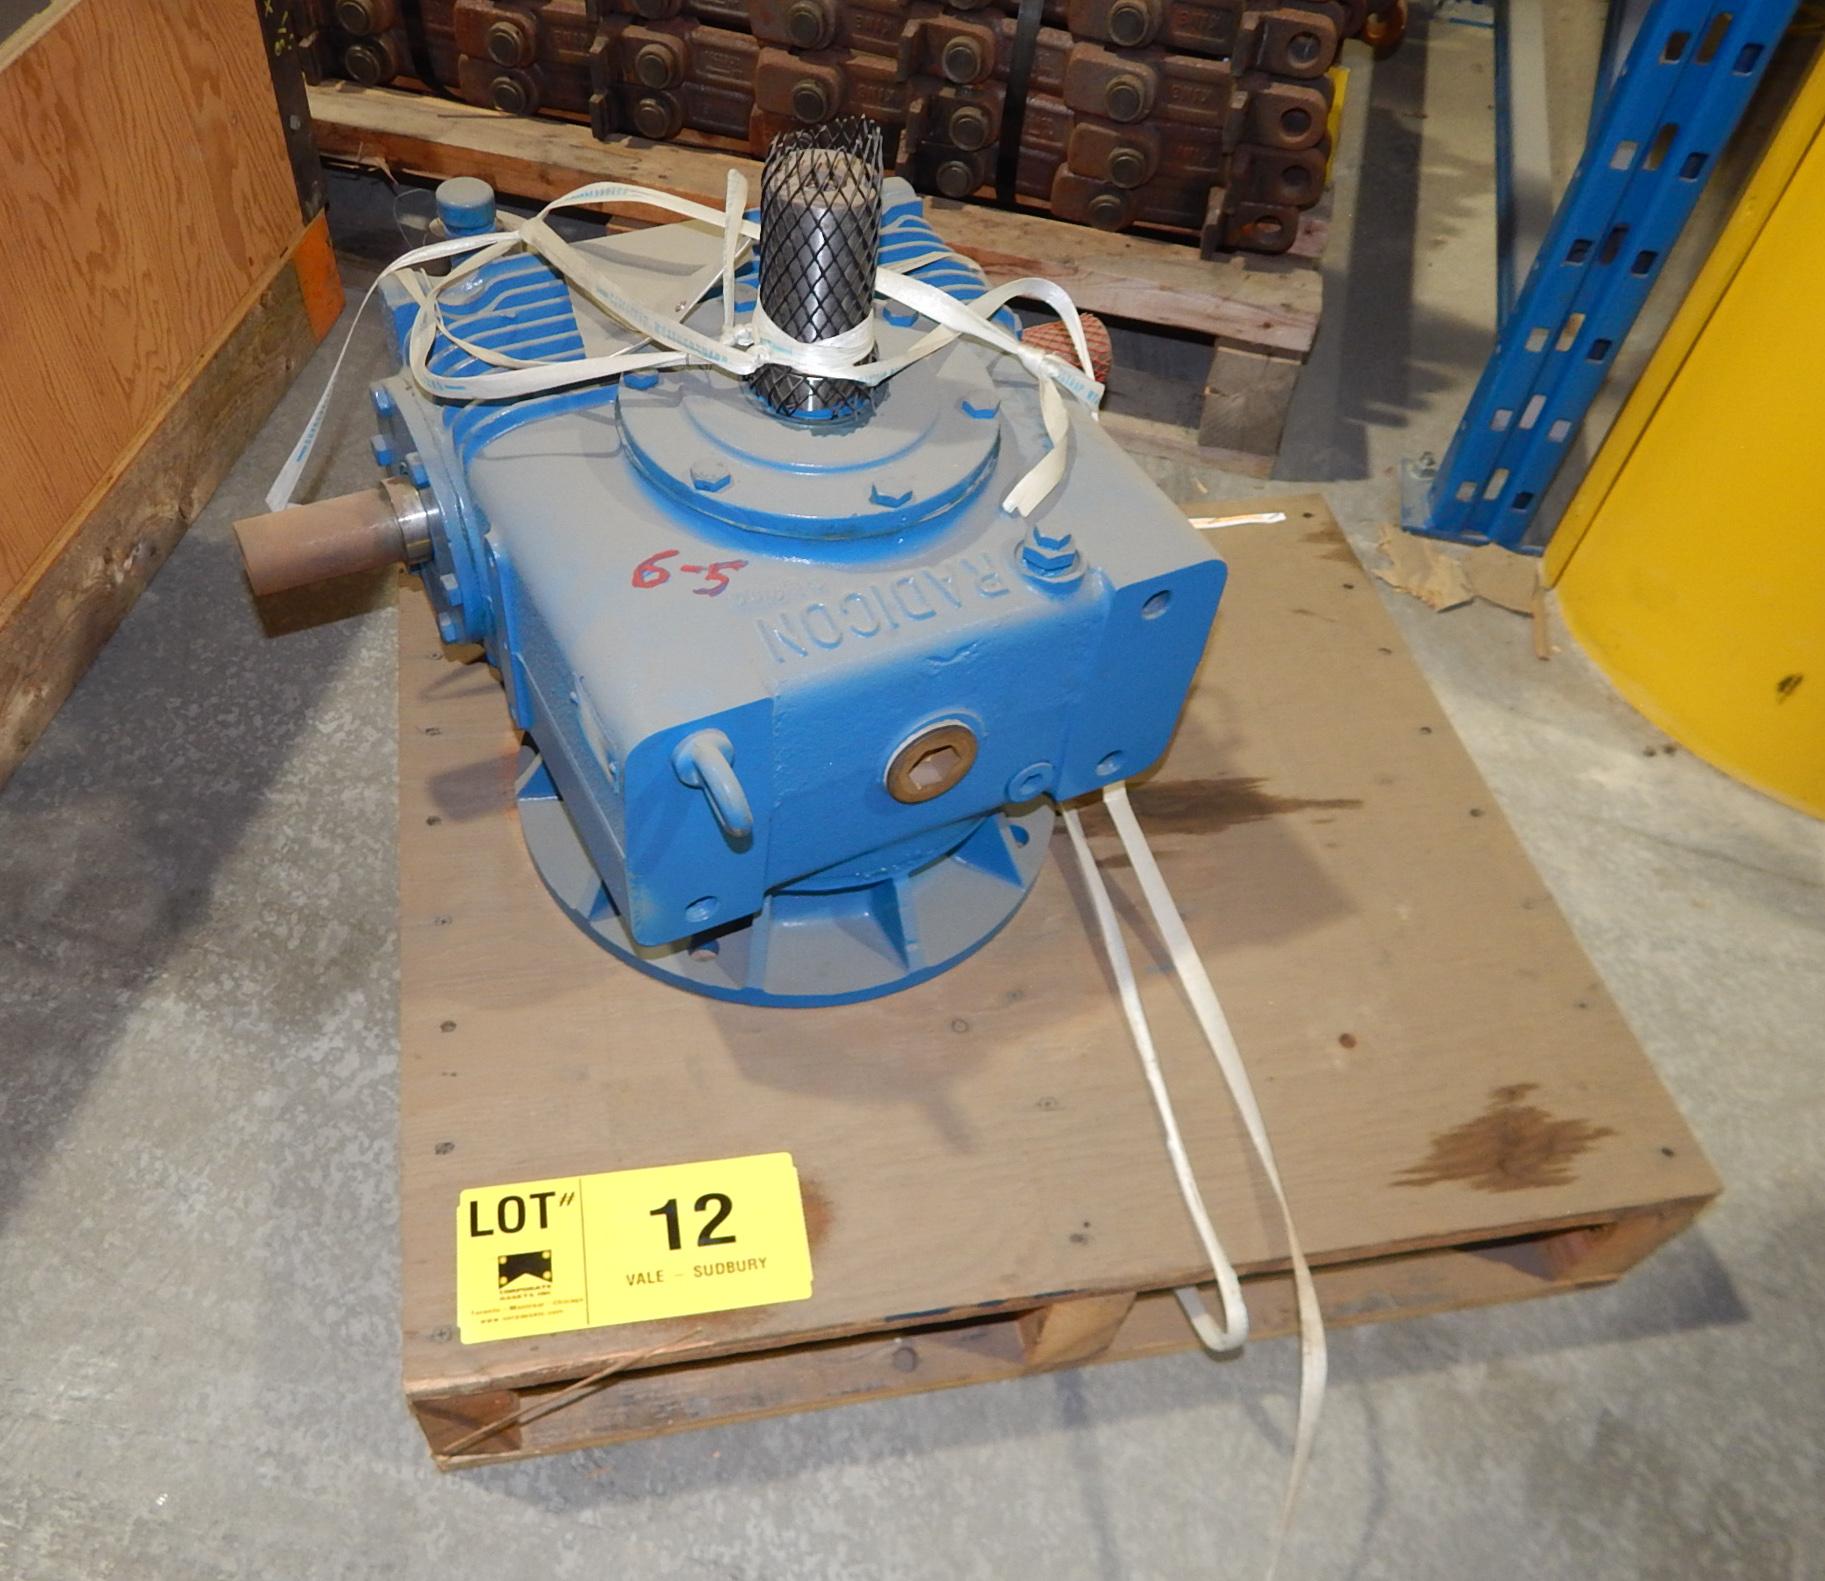 Lot 12 - RADICON 7.4:1 RATIO GEAR BOX (LOCATED AT AER WAREHOUSE)